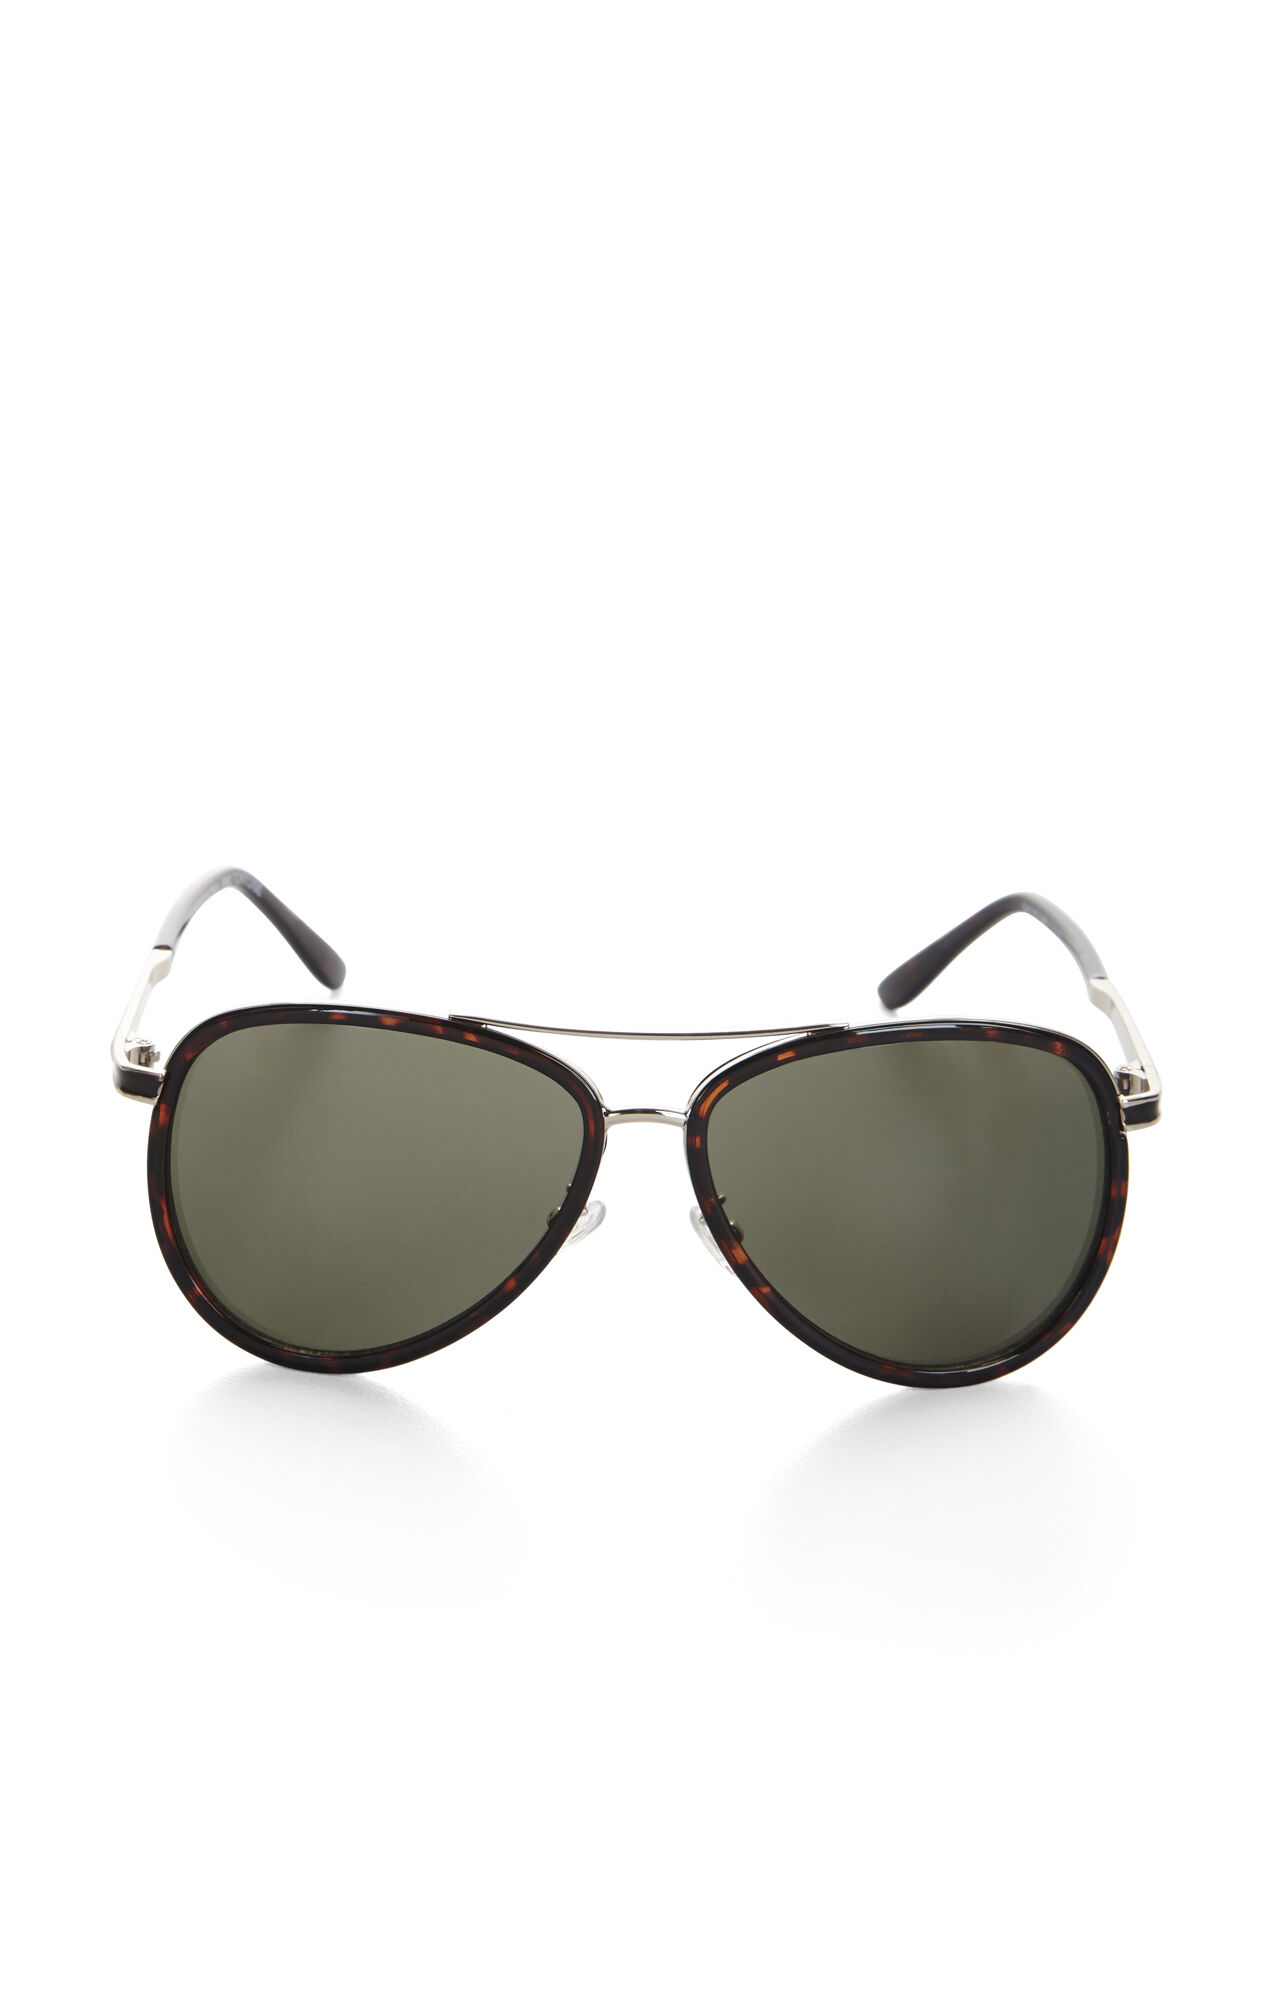 Combo Aviator Sunglasses